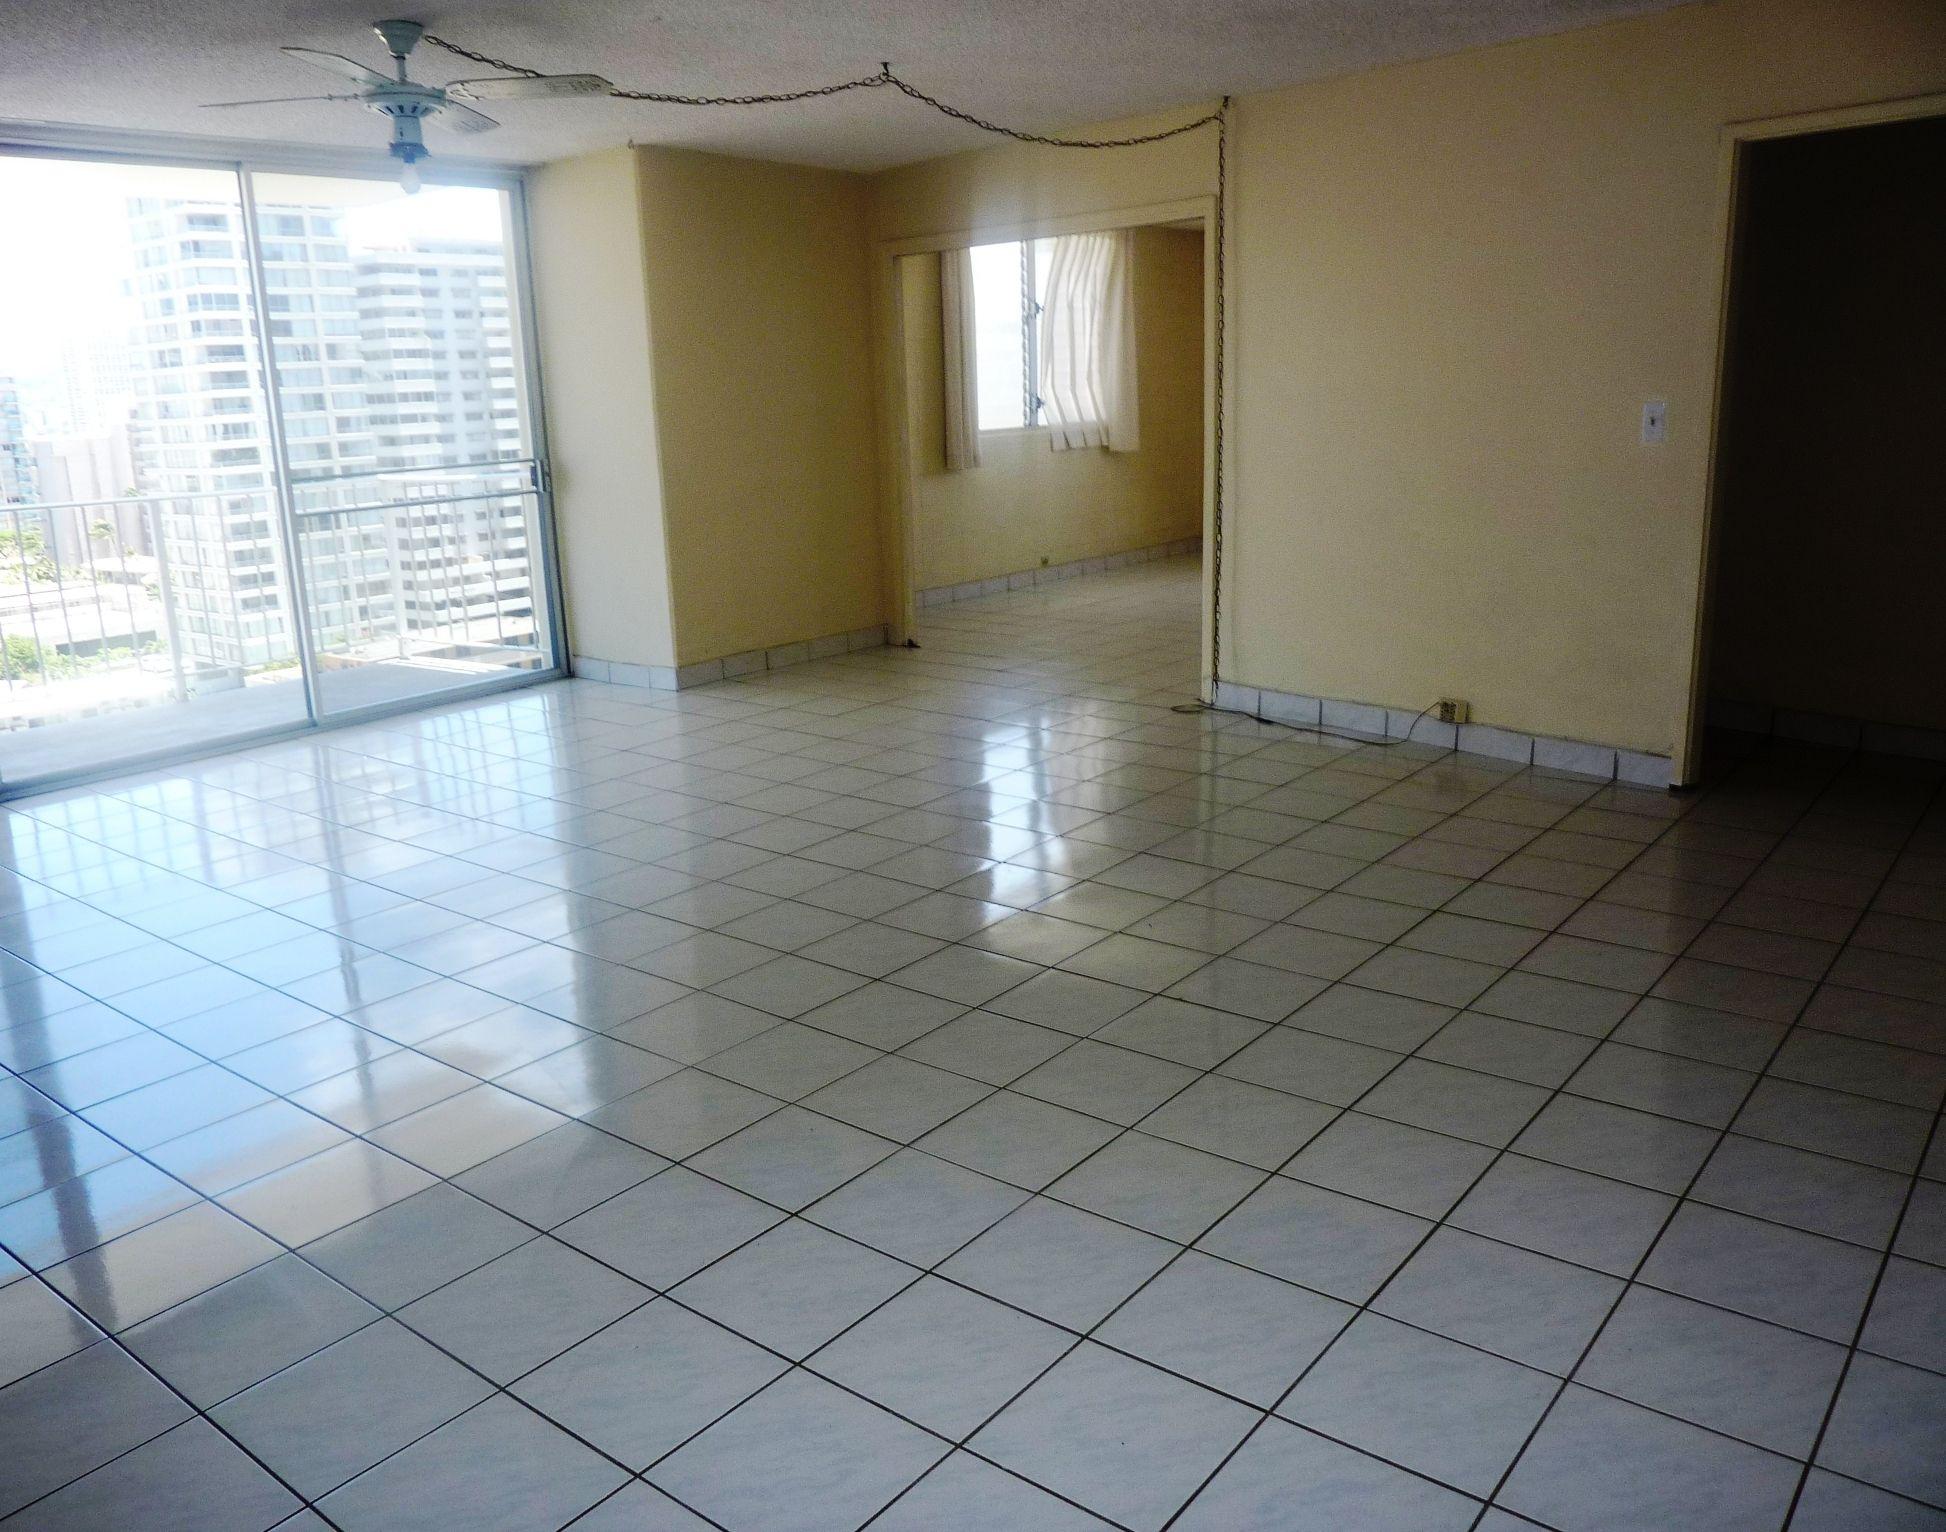 Waxing ceramic floor tiles httpnextsoft21 pinterest waxing ceramic floor tiles dailygadgetfo Choice Image